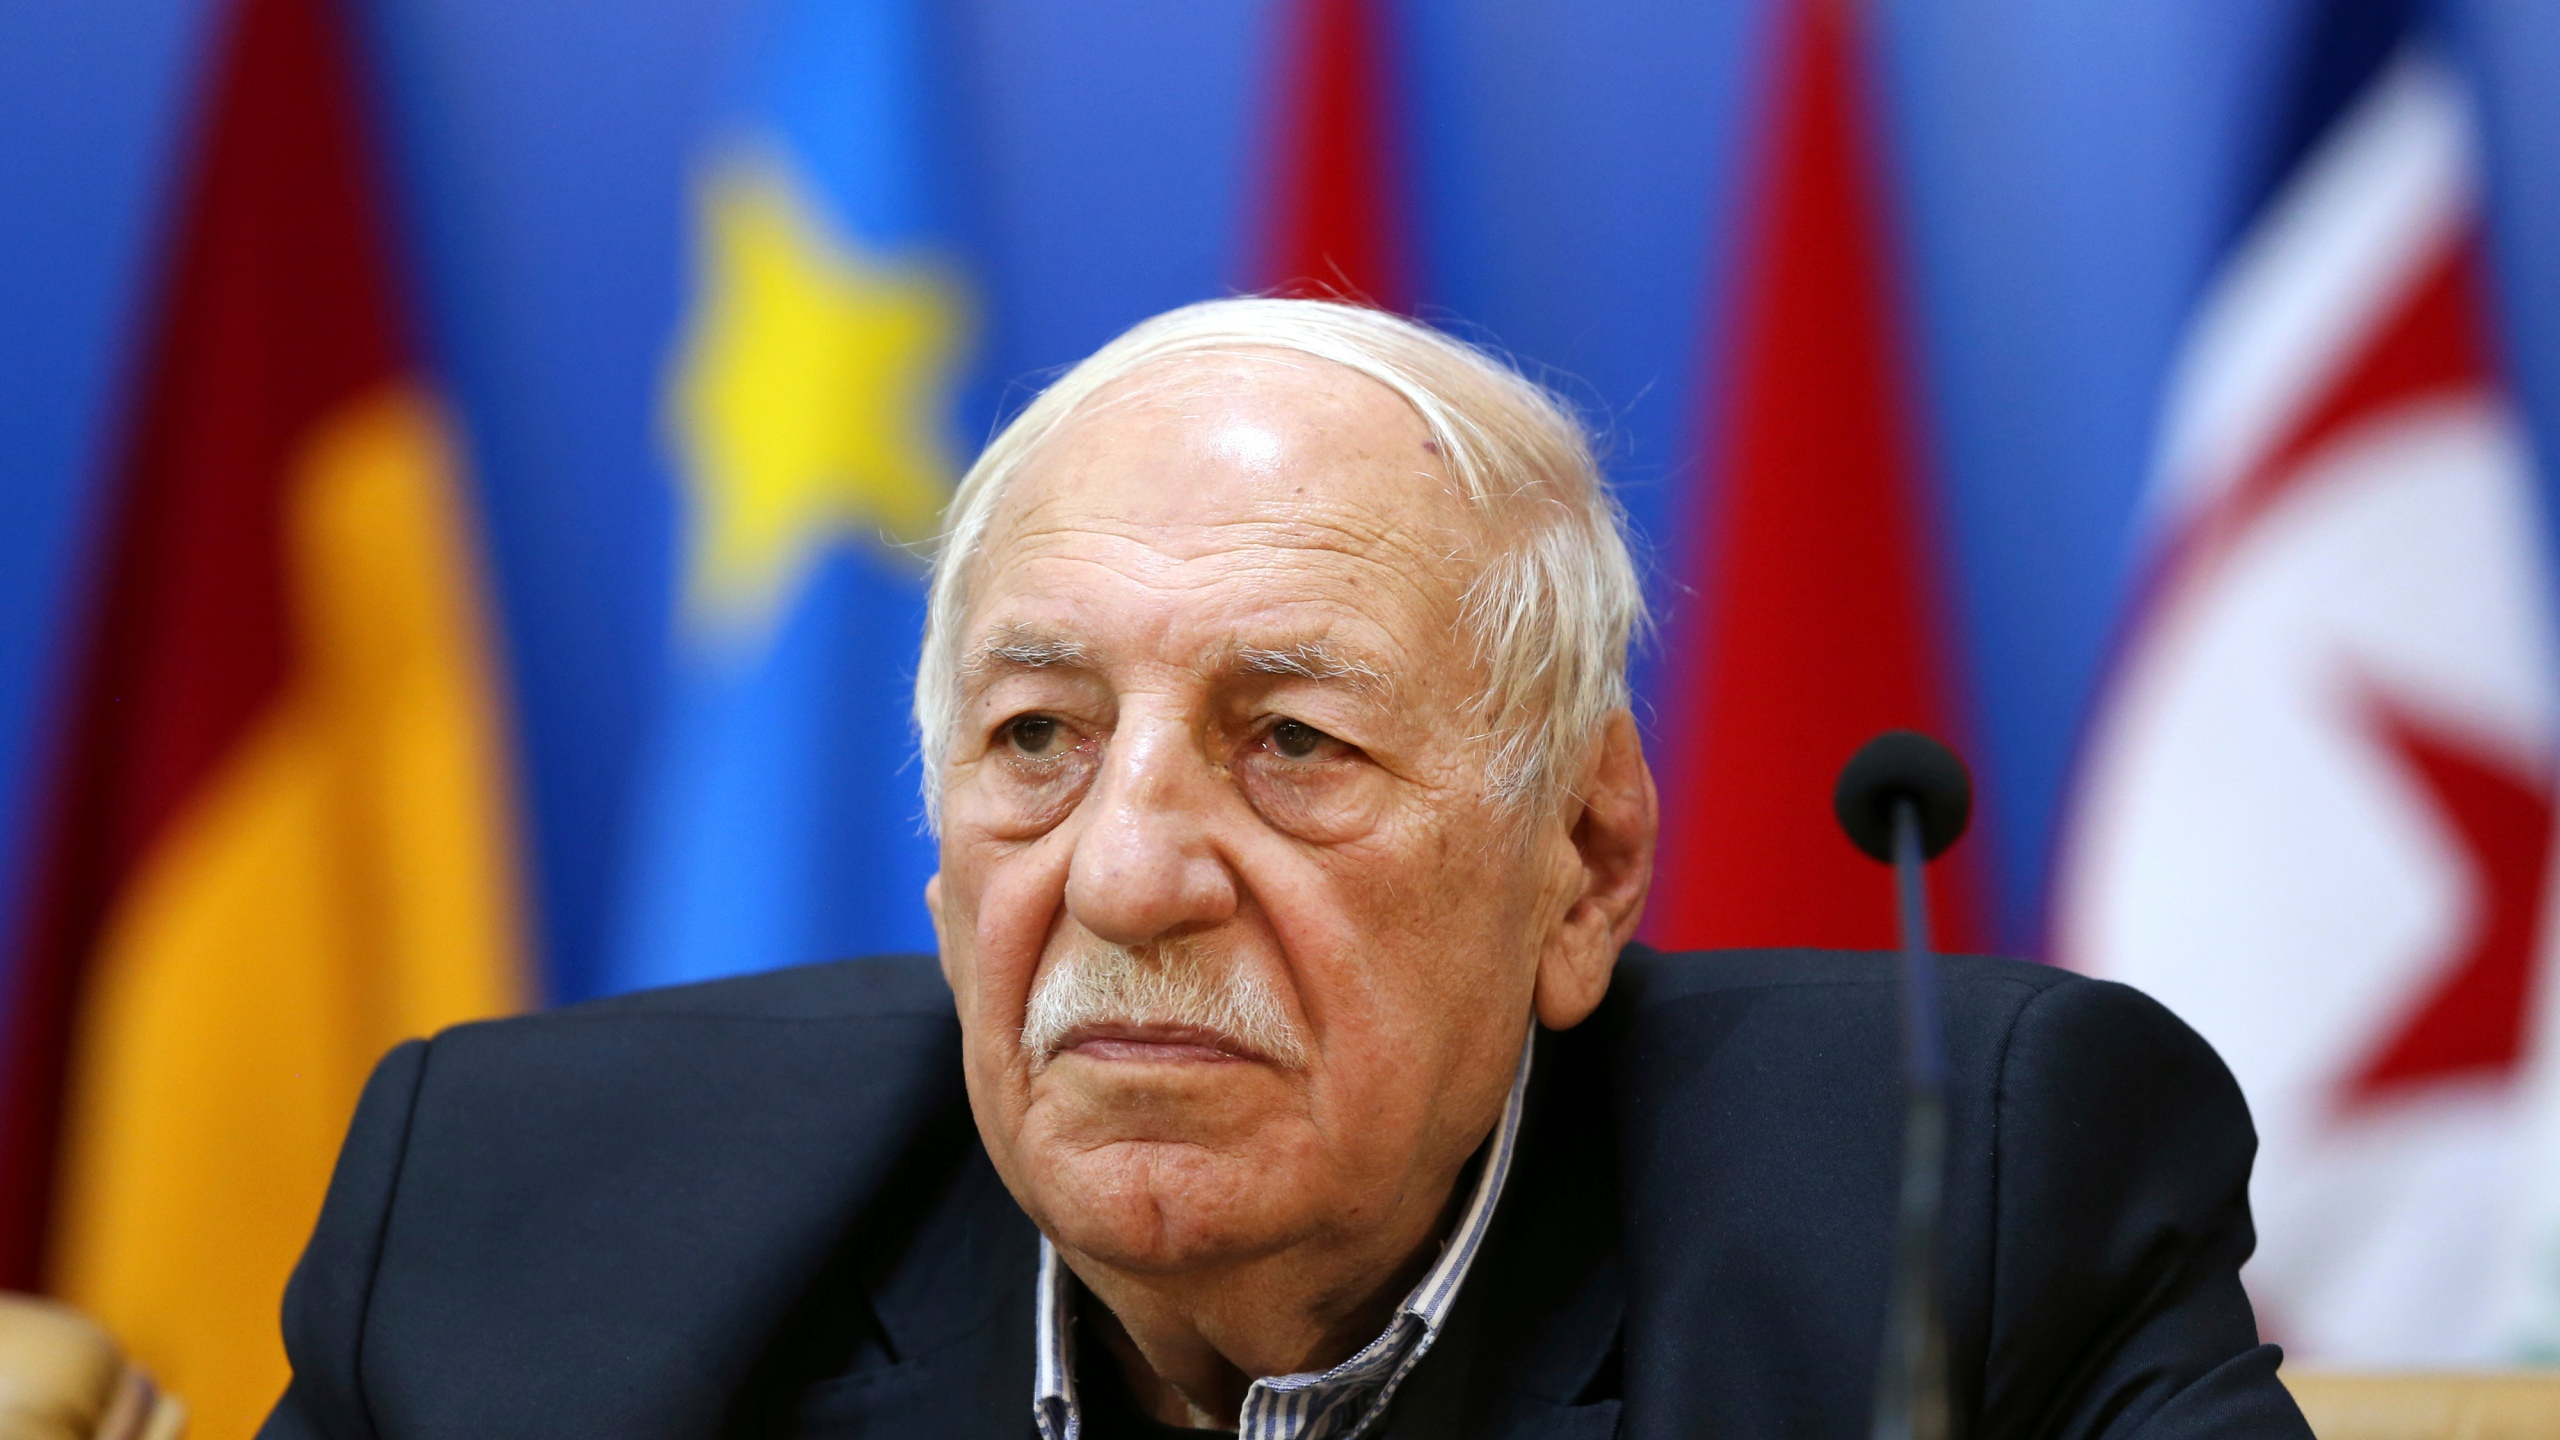 Ahmed Jibril